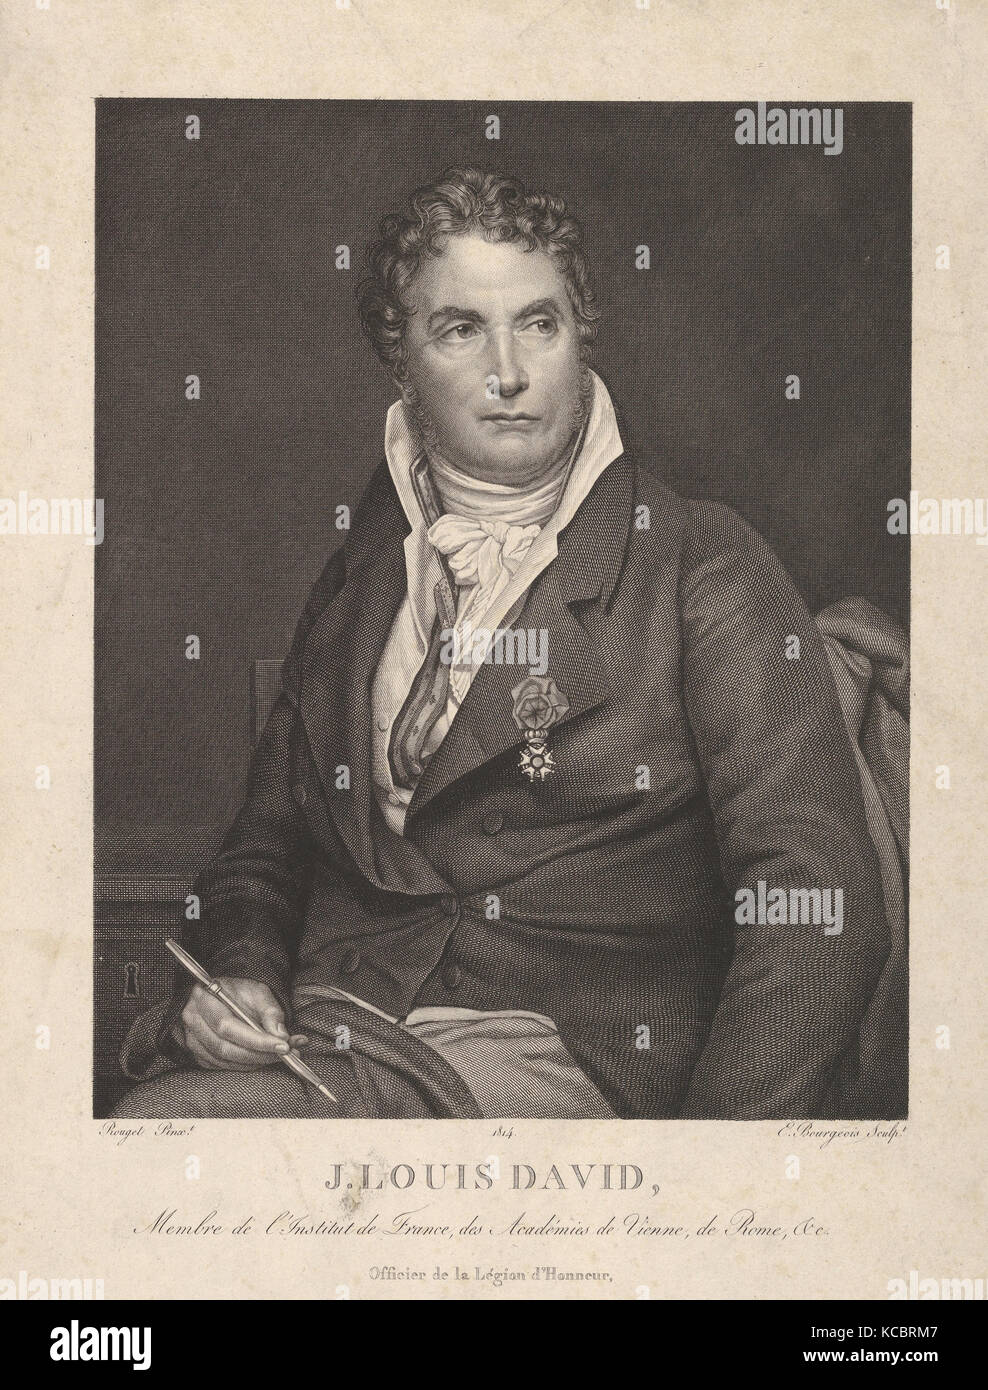 Portrait of J. Louis David, 1814, Engraving, sheet: 13 x 9 1/4 in. (33 x 23.5 cm), Prints, Eugène Bourgeois - Stock Image